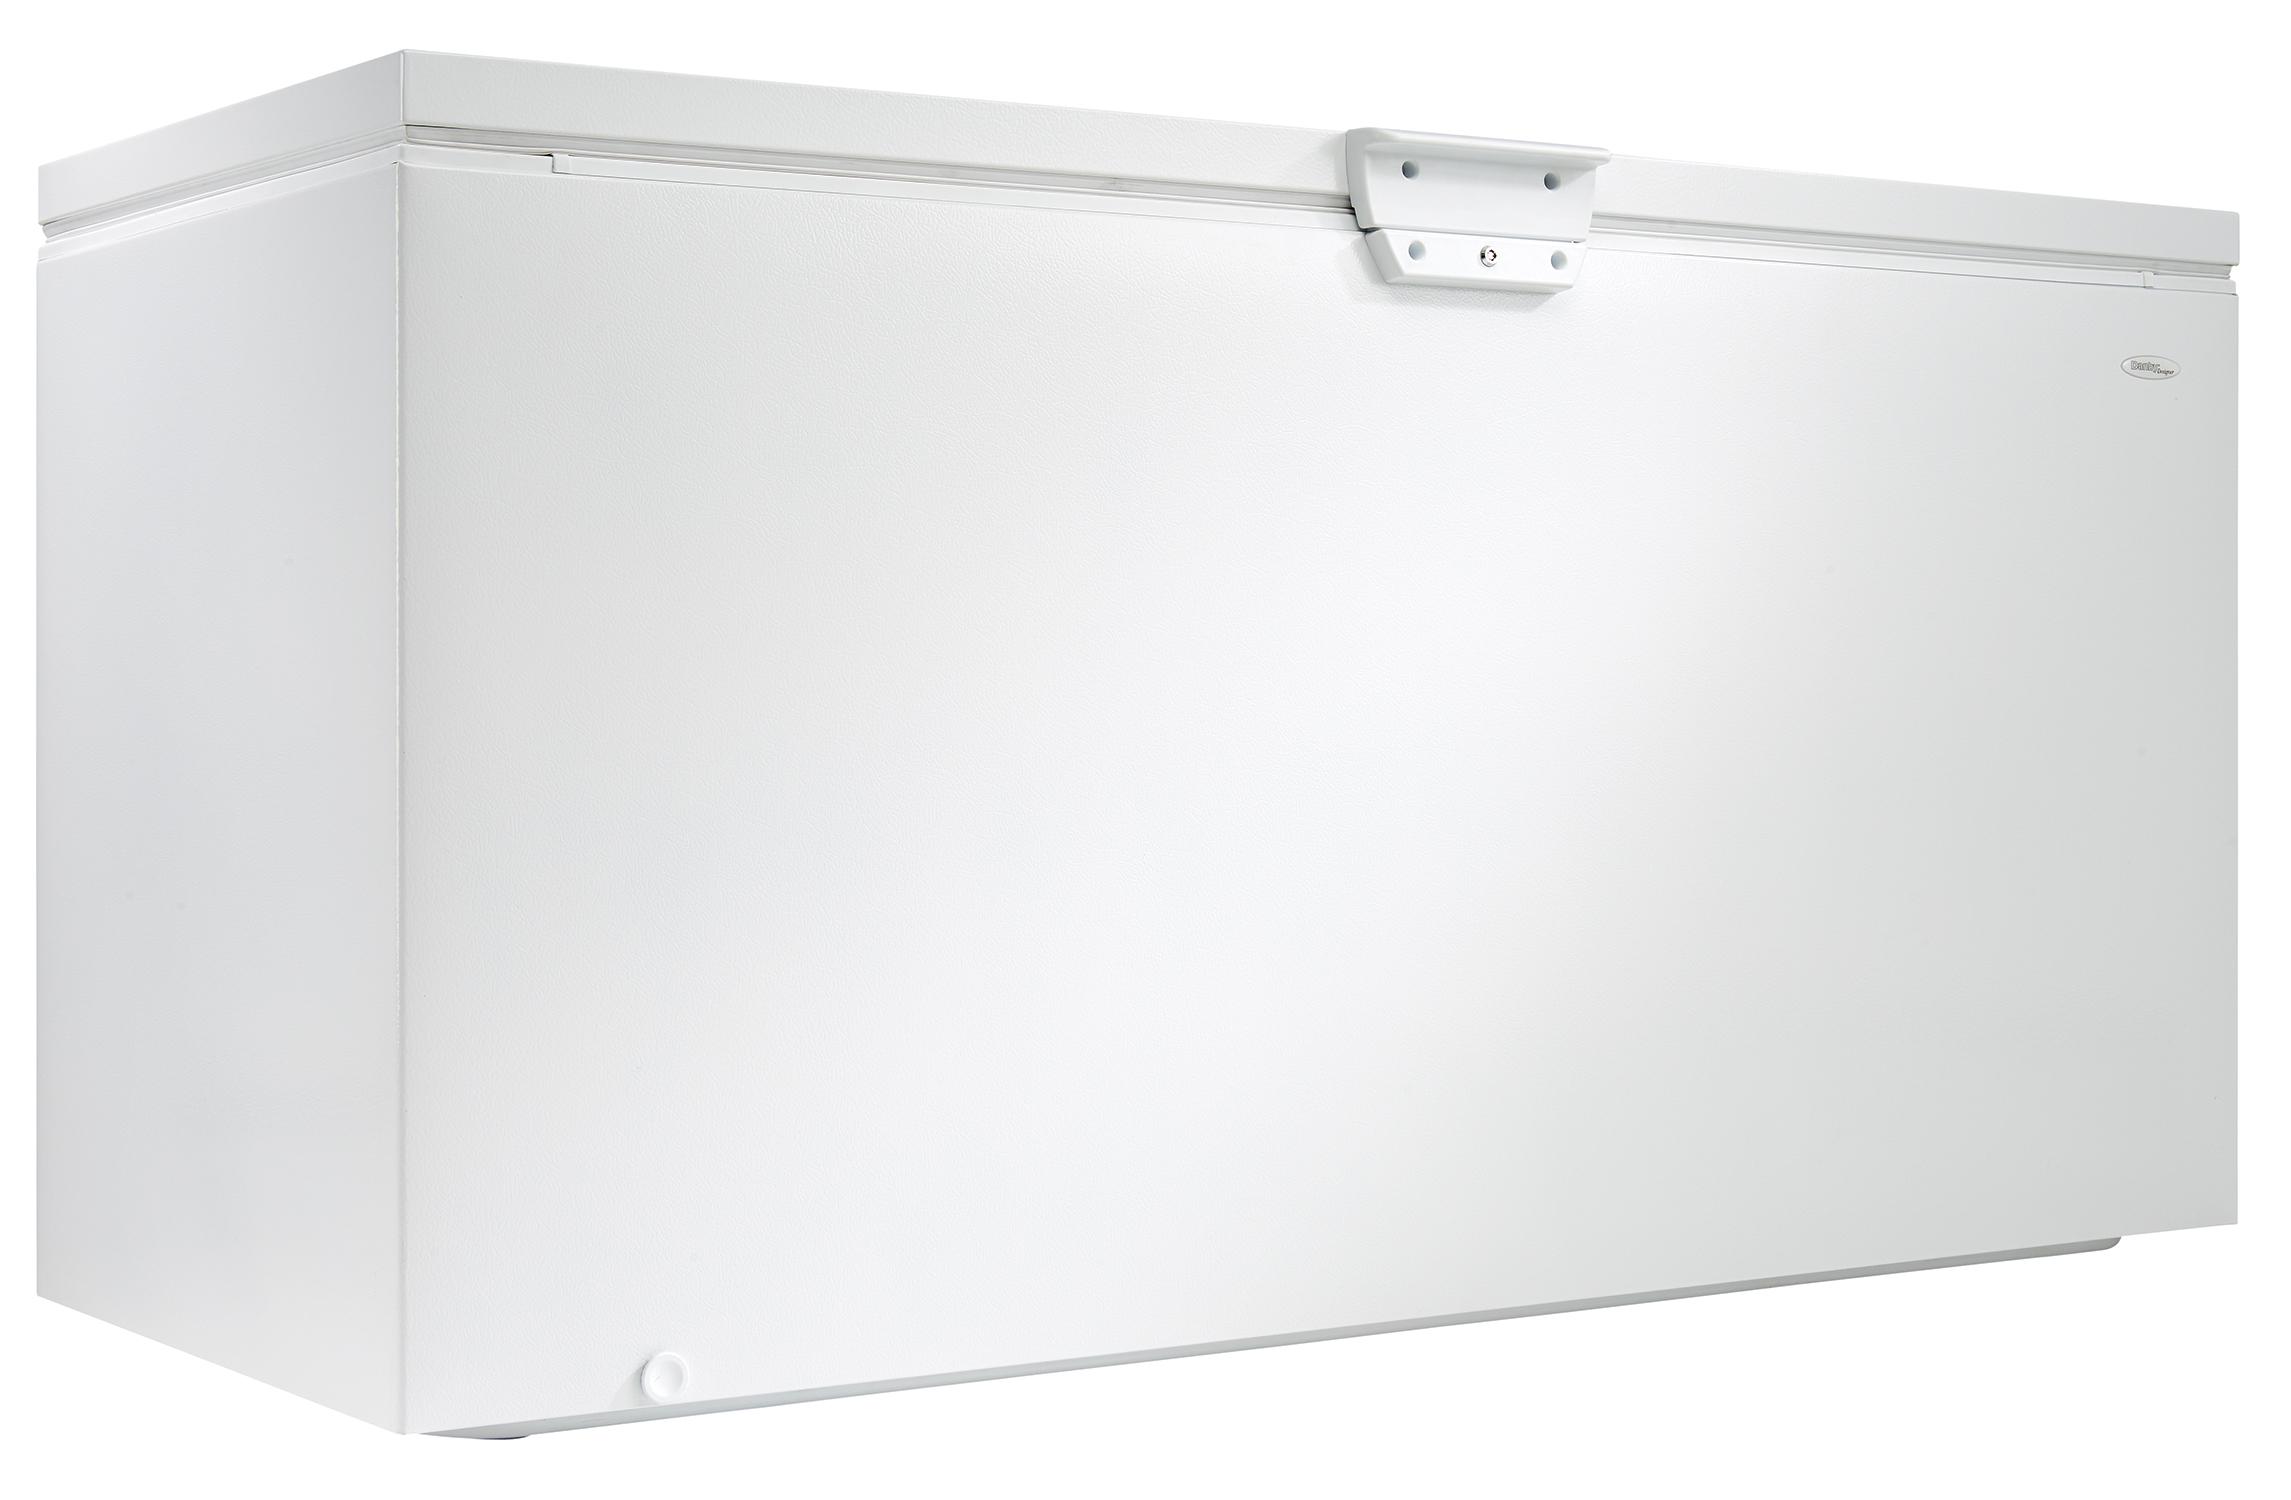 Danby Countertop Ice Maker Manual : DCFM217A1WDD Danby Designer 21.7 cu. ft. Freezer EN